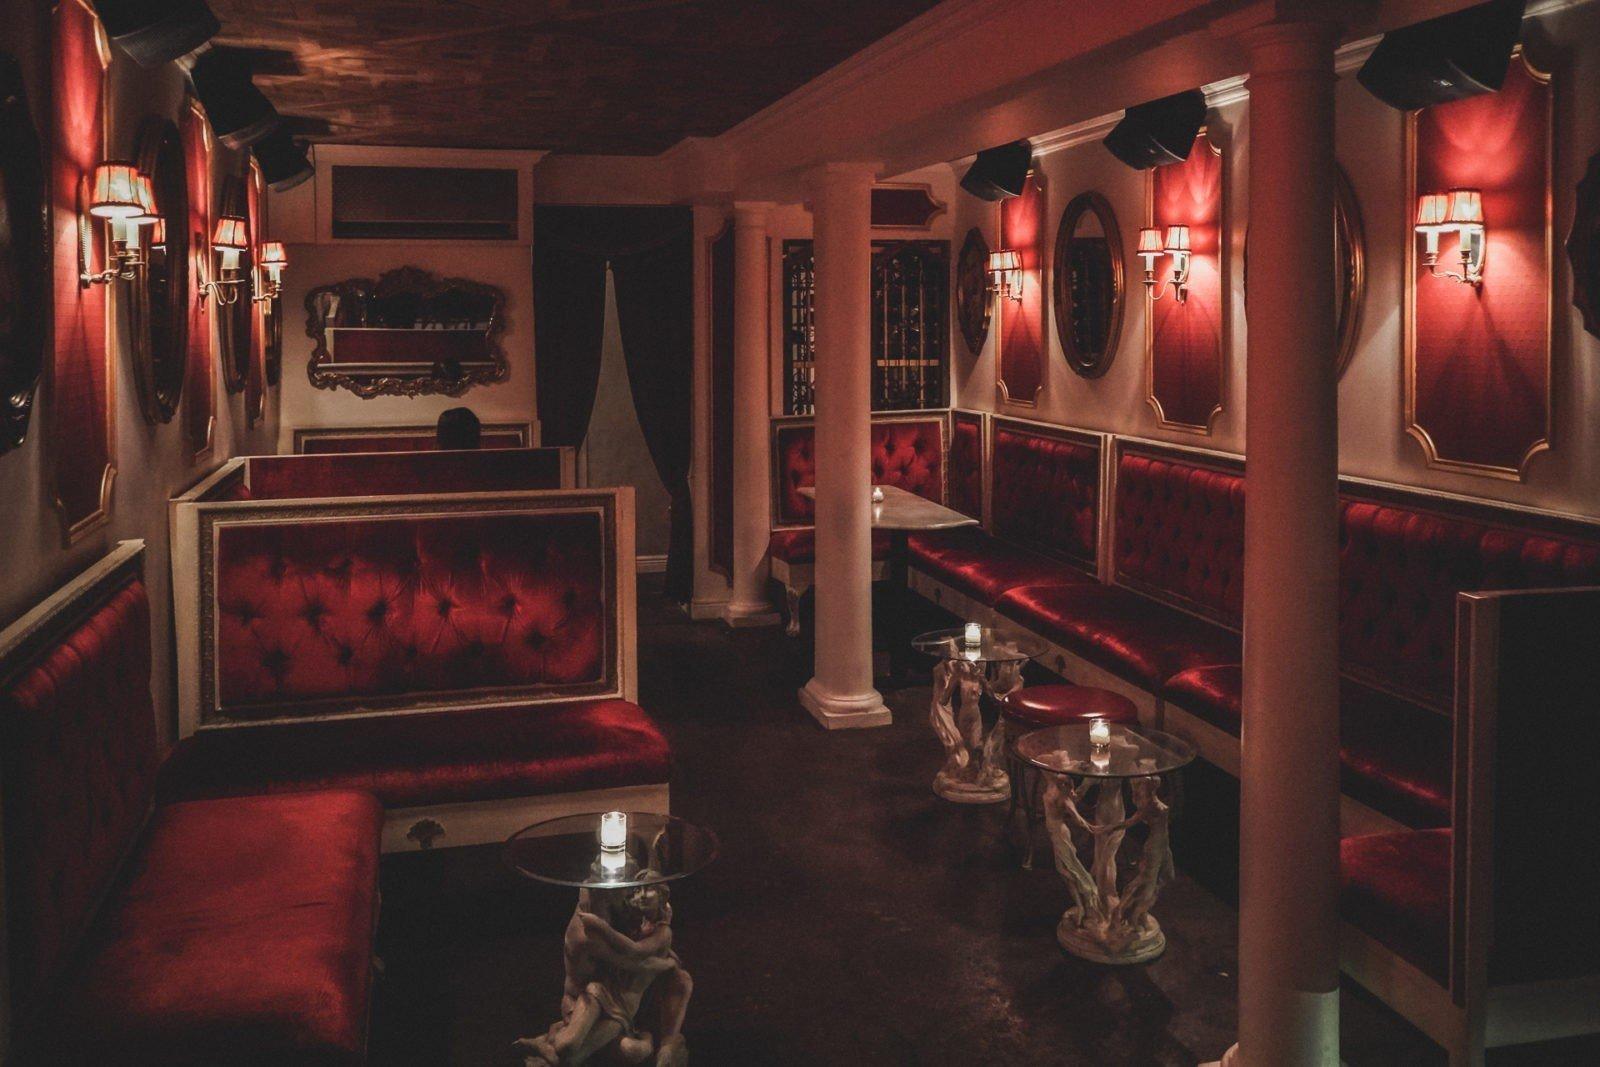 The Opulent Interior of Le Boudoir